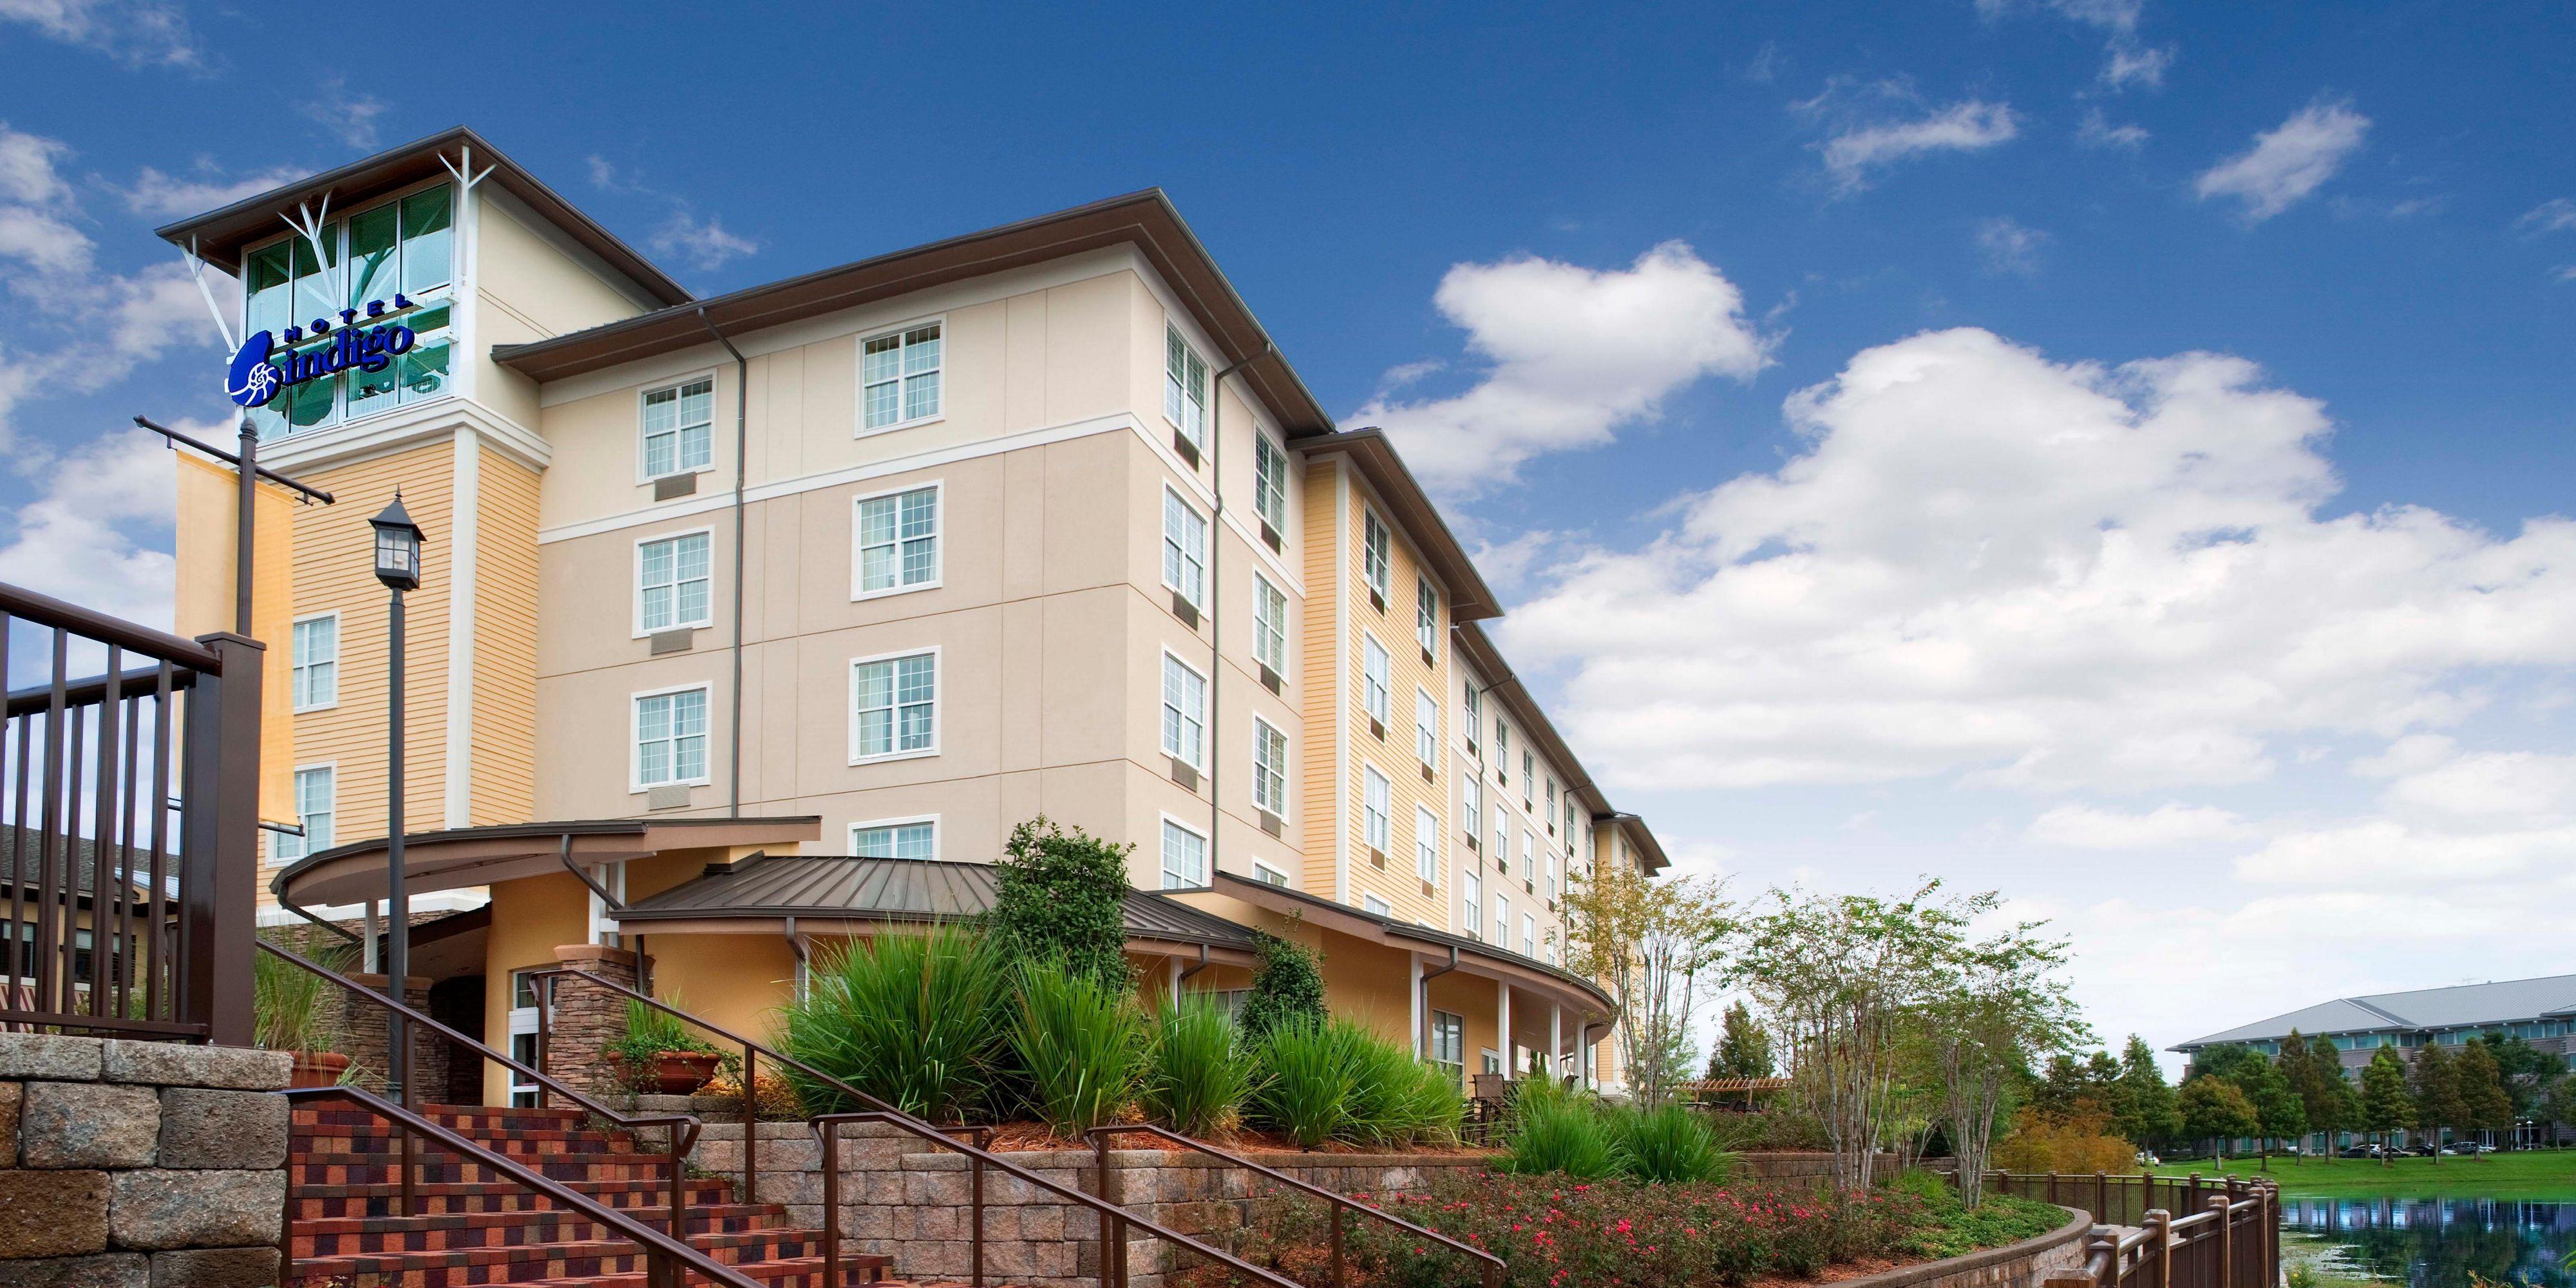 Home Hotel Indigo Jacksonville Hotels Image Banner